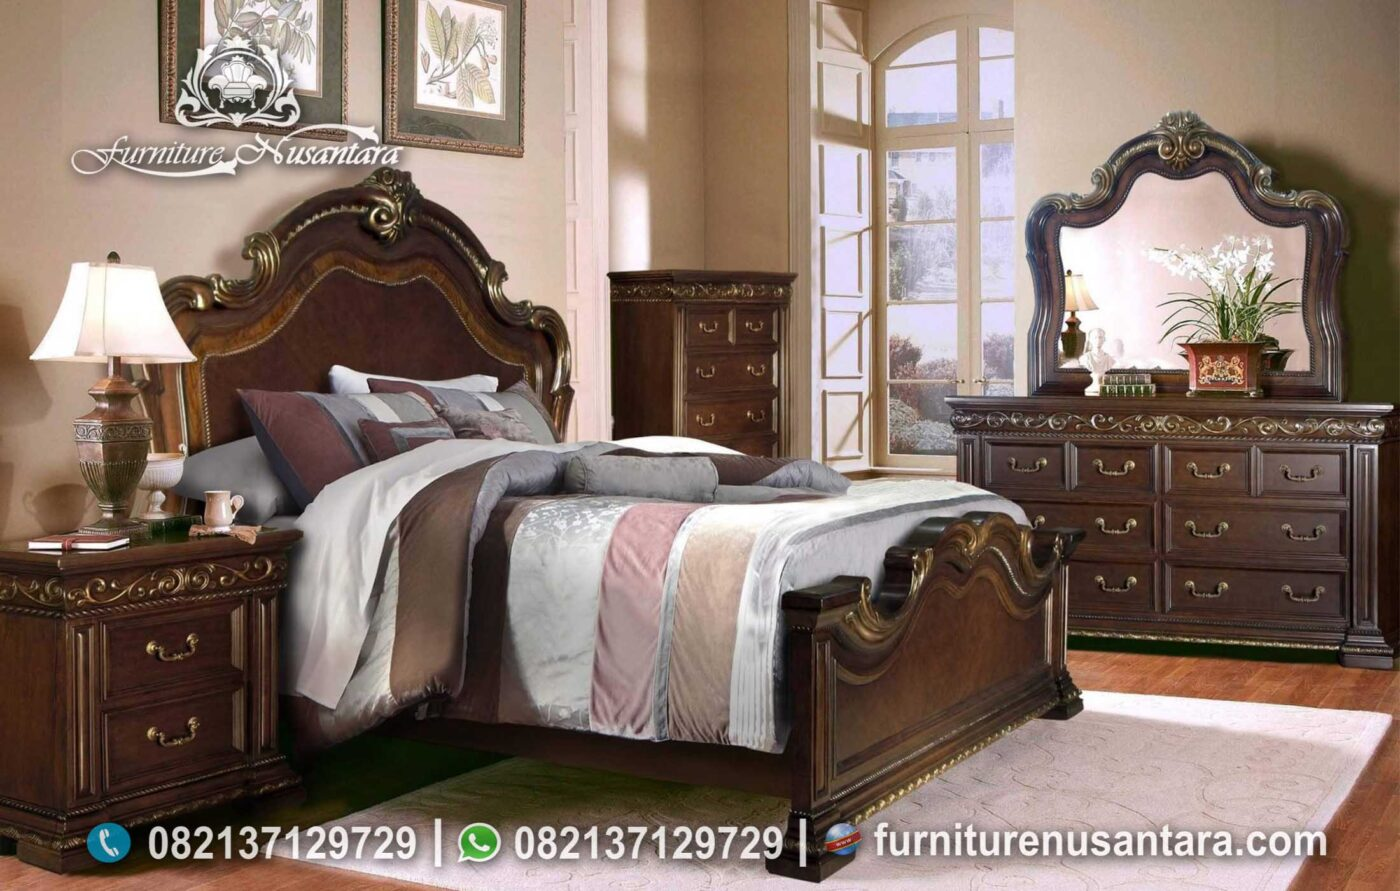 Kamar Tidur Antik Natural KS-101, Furniture Nusantara